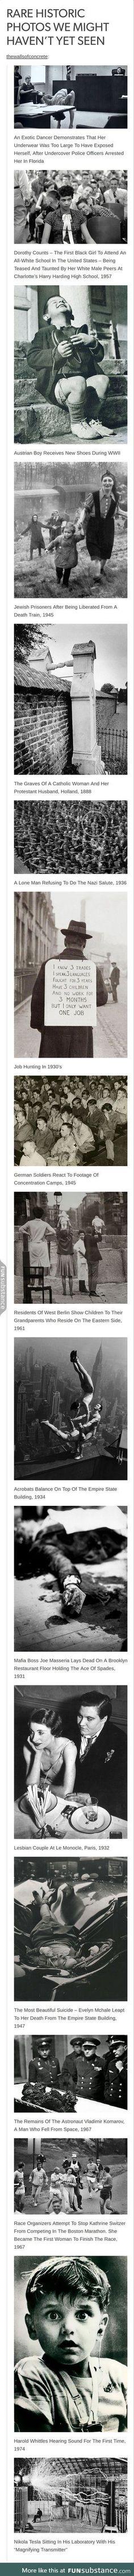 incredibly striking historical photos